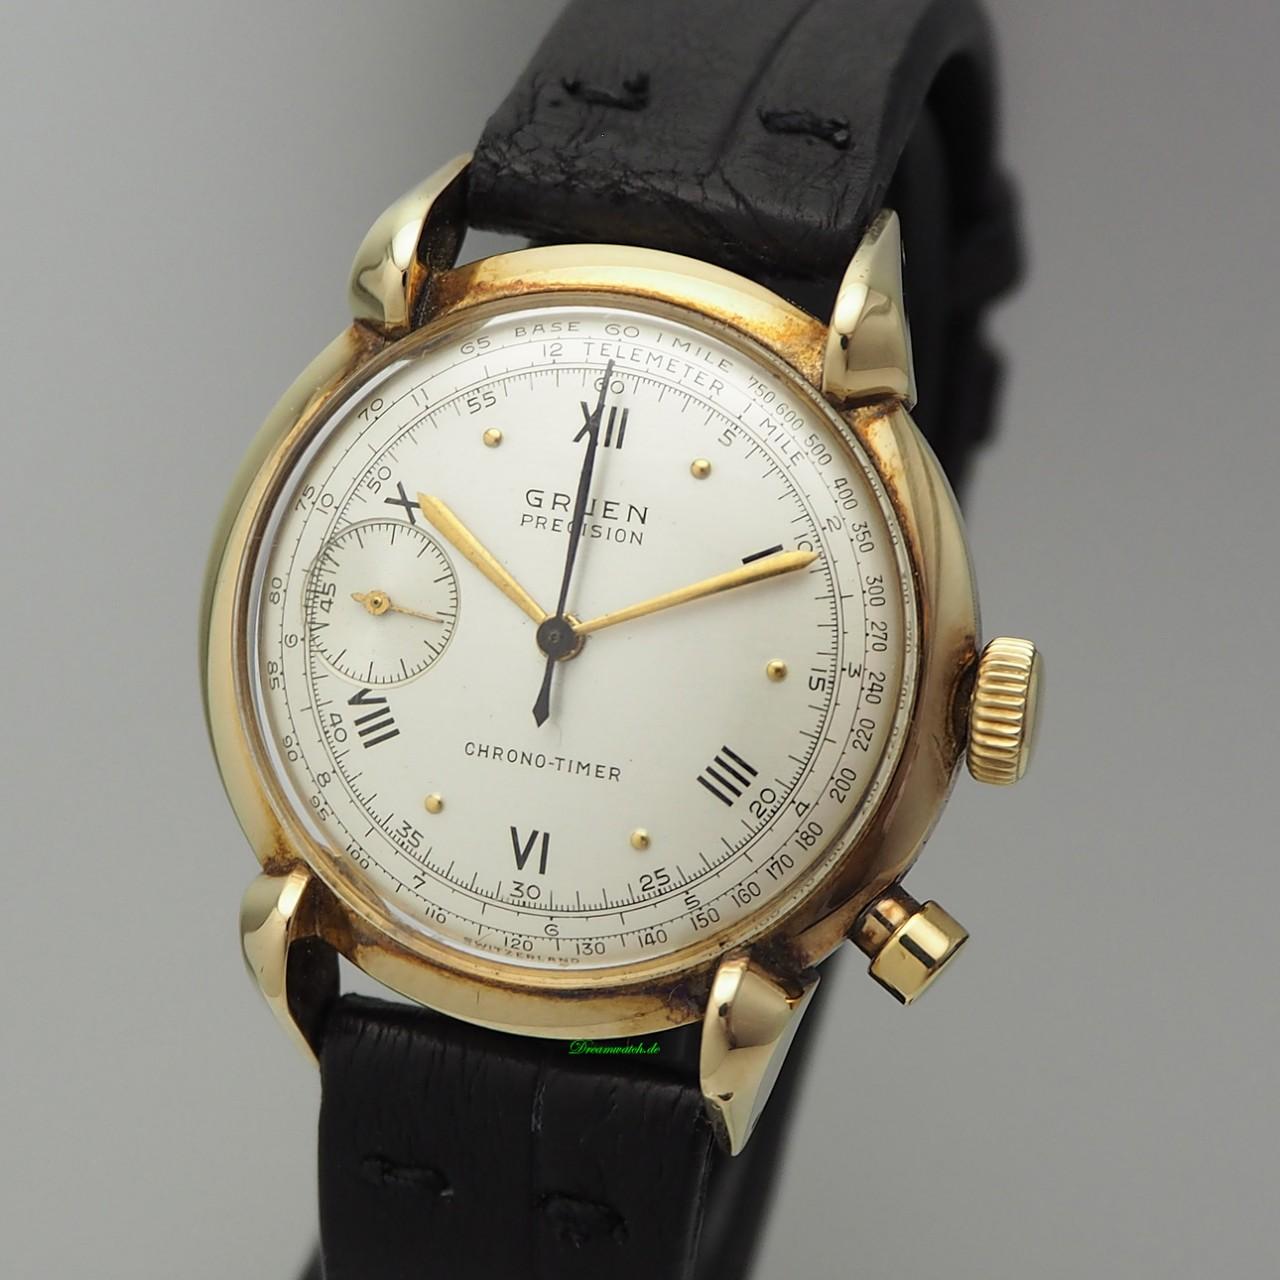 Gruen Vintage Chrono-Timer Chronograph, Gold 14k/585, very rare